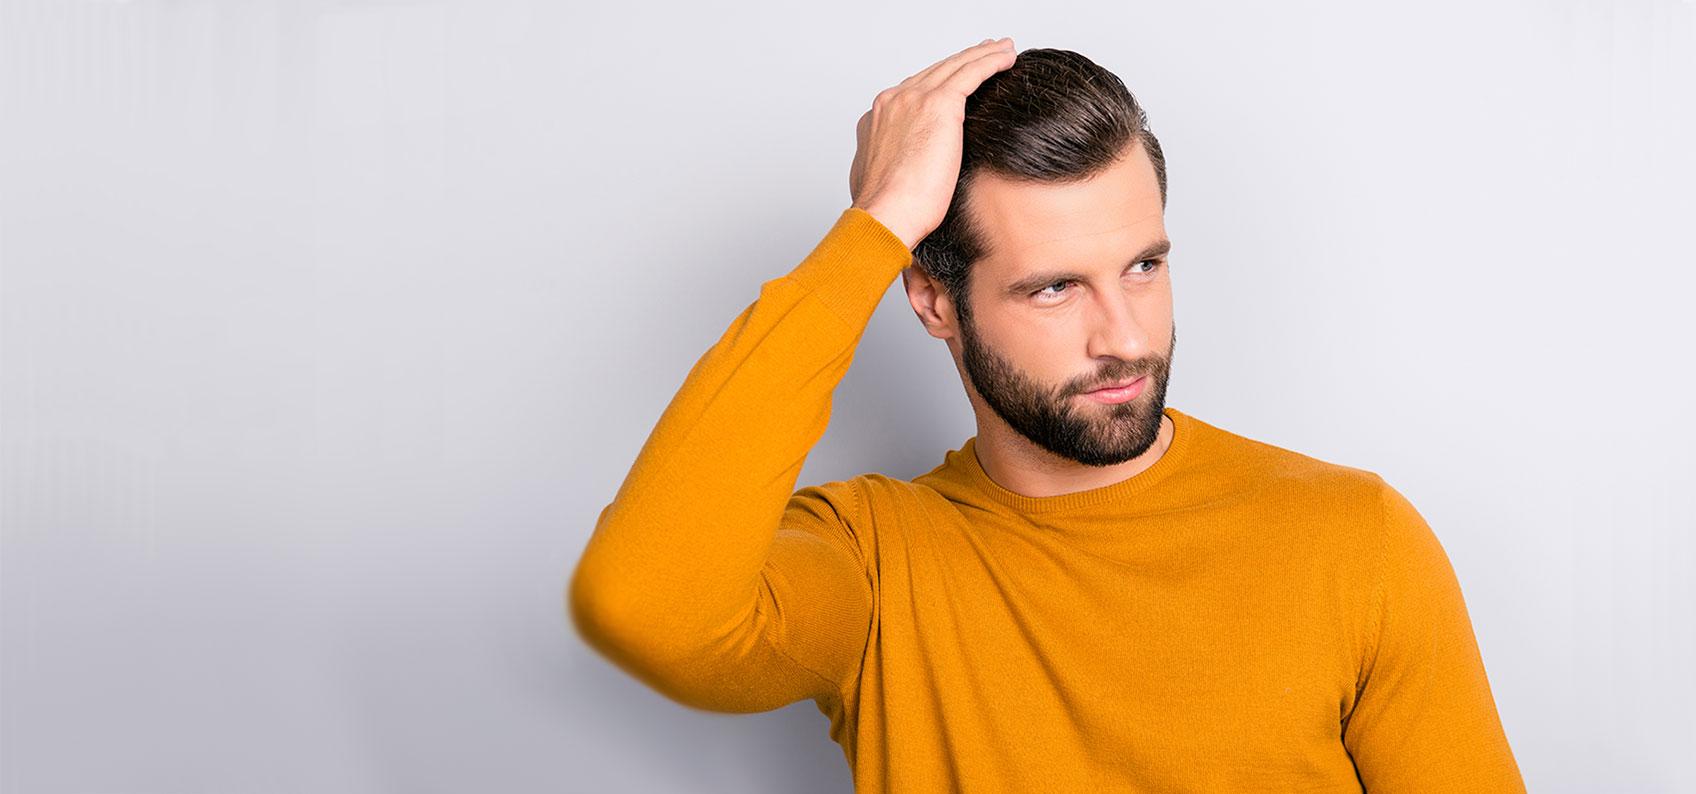 Man running hands through hair robotic hair restoration